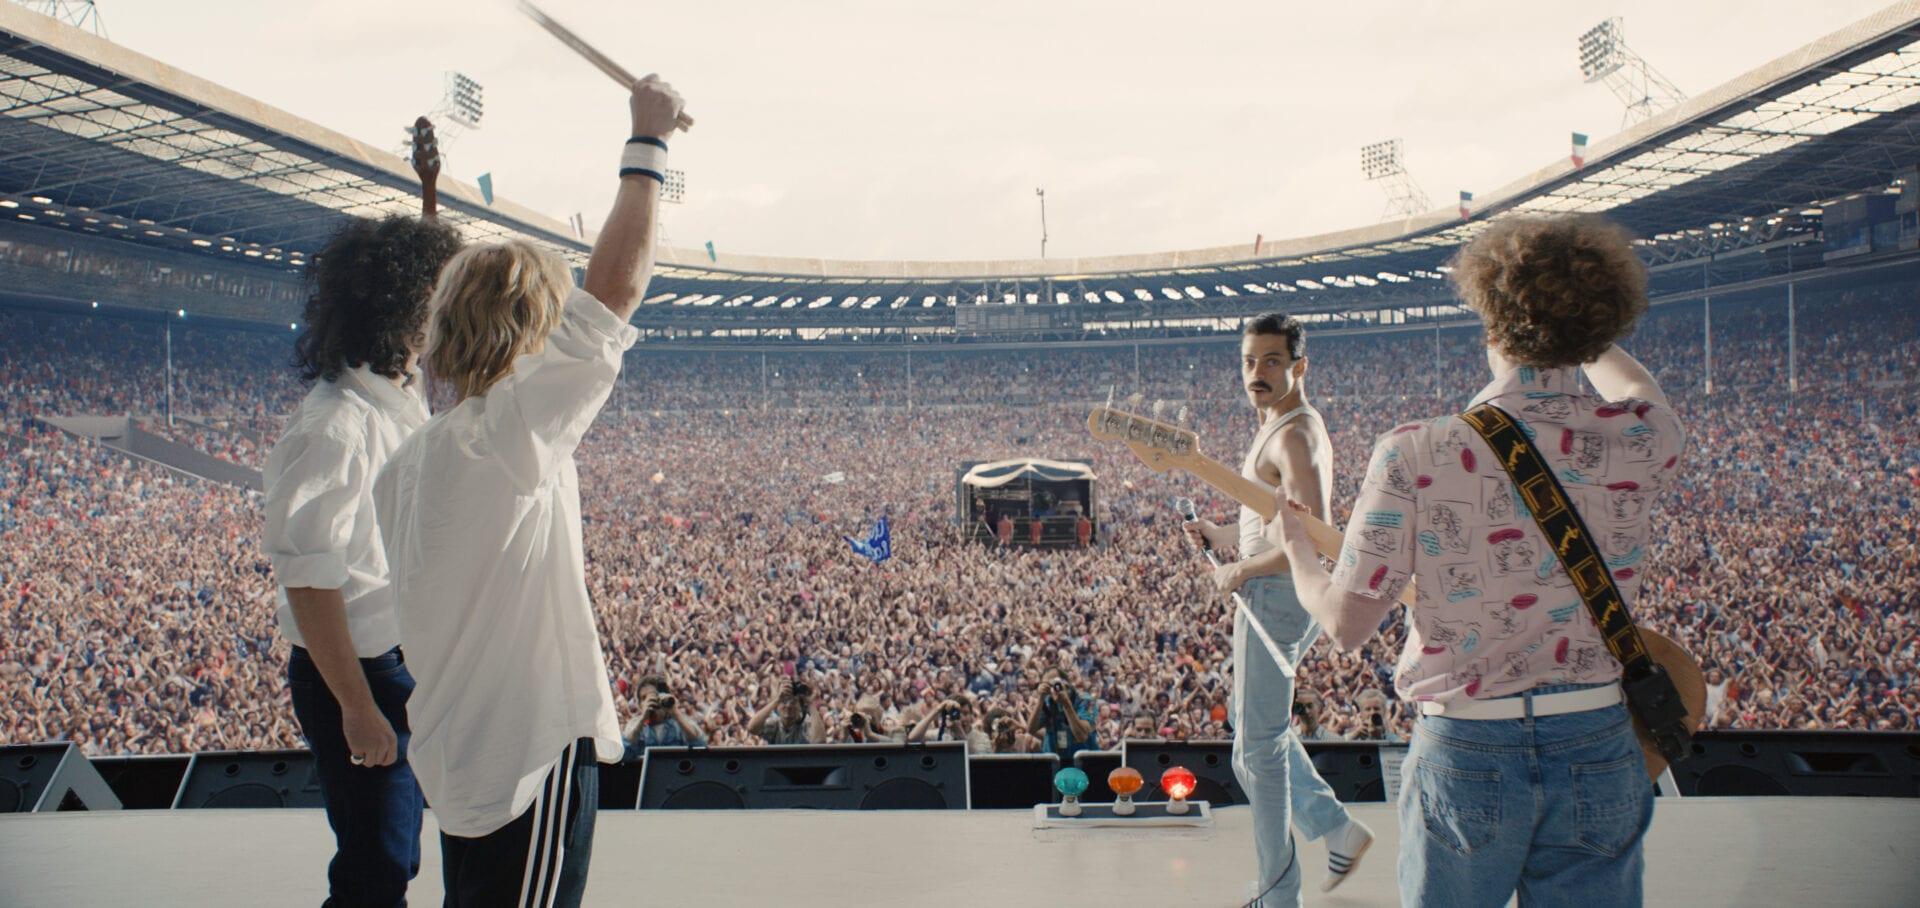 bohemian rhapsody queen live aid wembley stadium